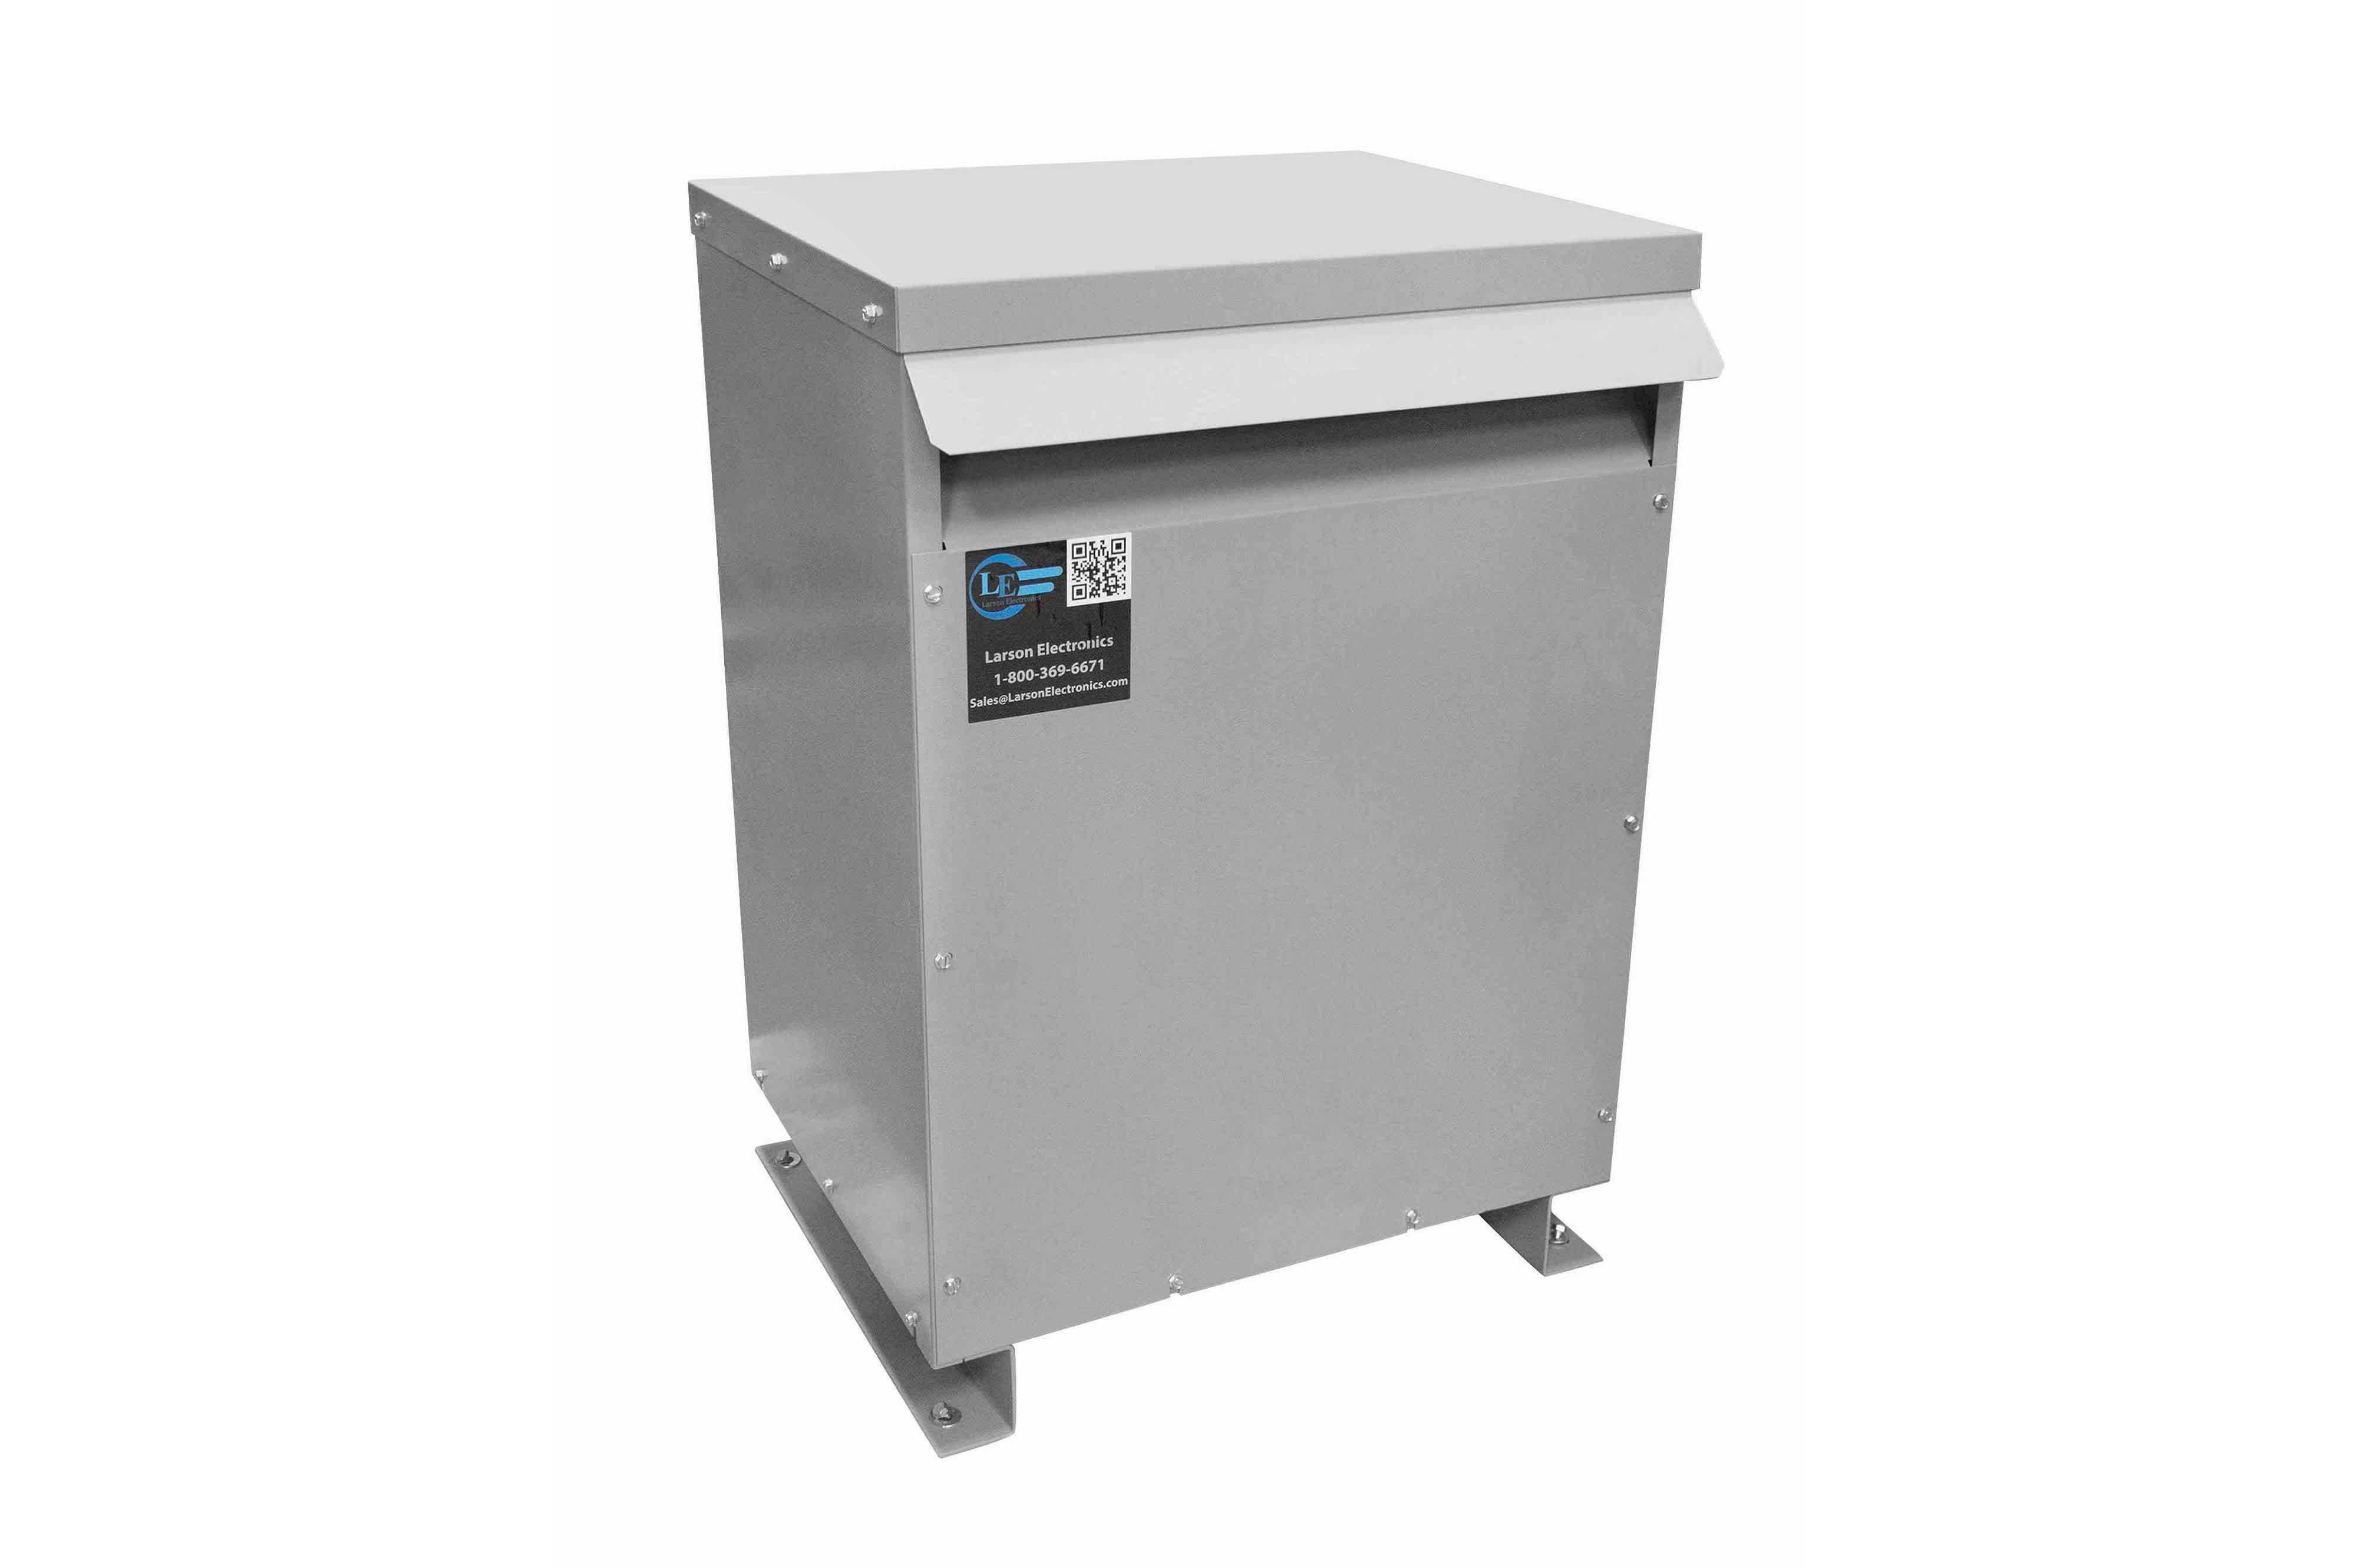 14 kVA 3PH Isolation Transformer, 460V Wye Primary, 400V Delta Secondary, N3R, Ventilated, 60 Hz